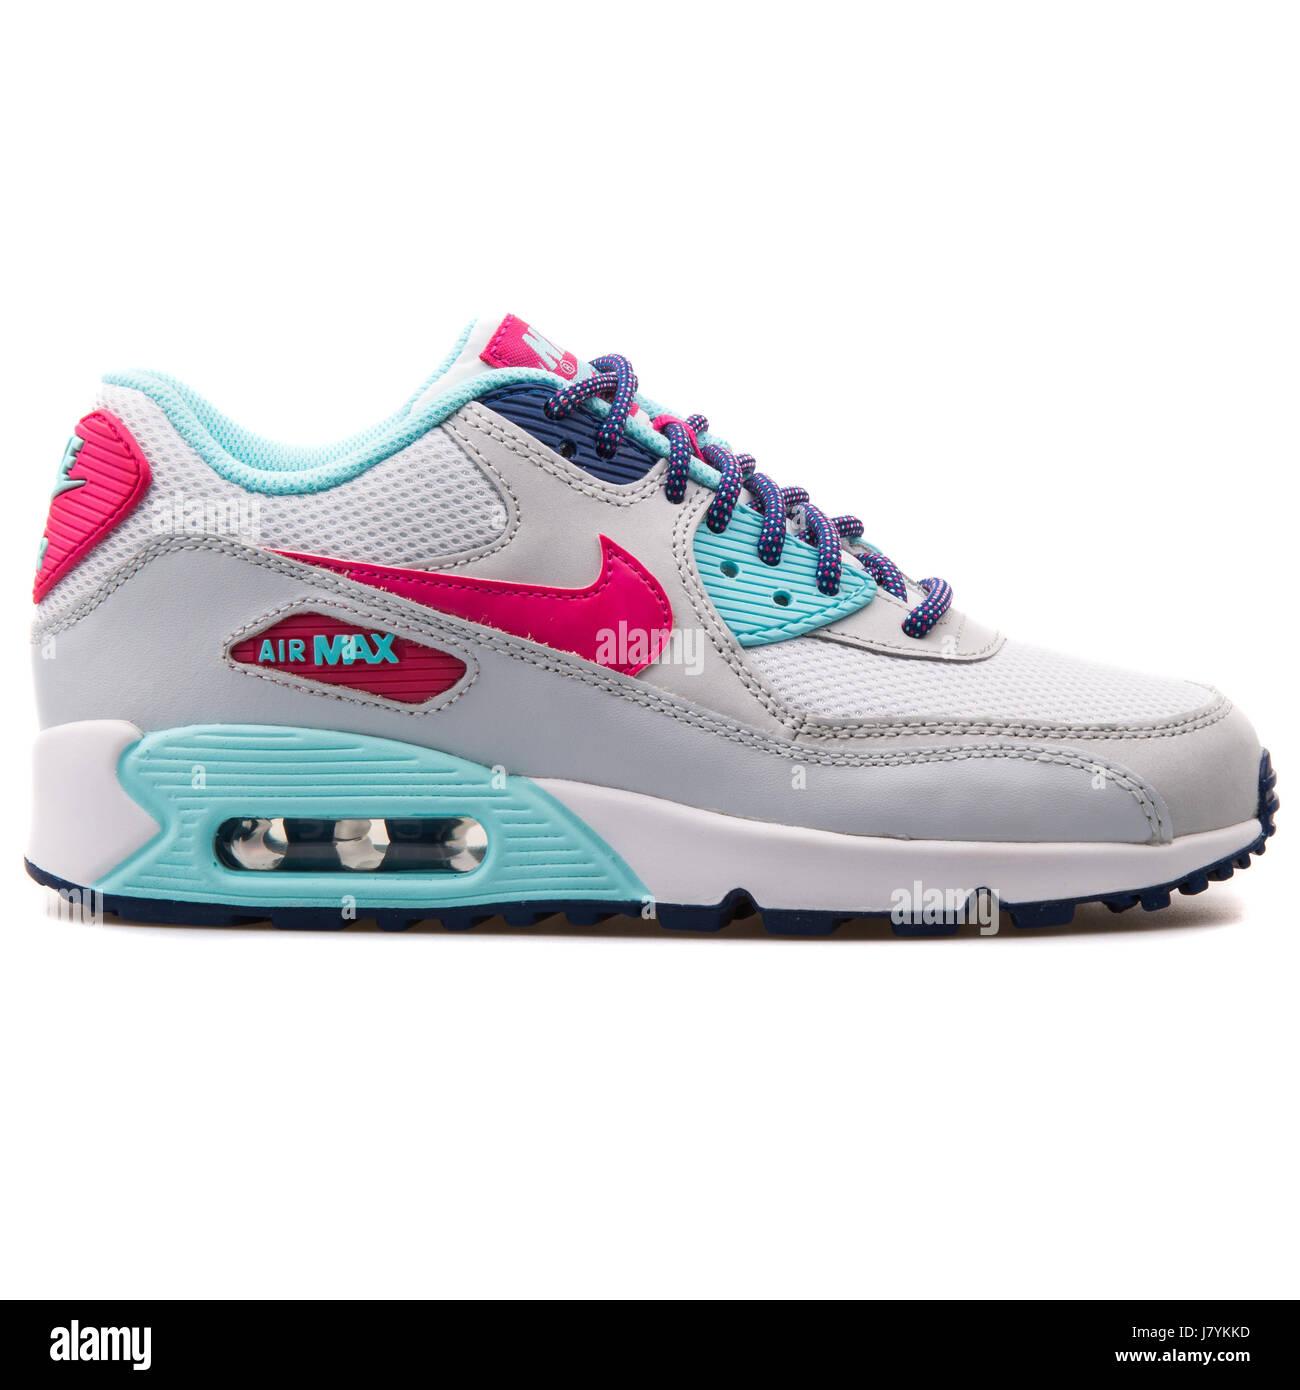 Nike Air Max 90 Mesh (GS) Jugend weiße lebendige rosa Copa